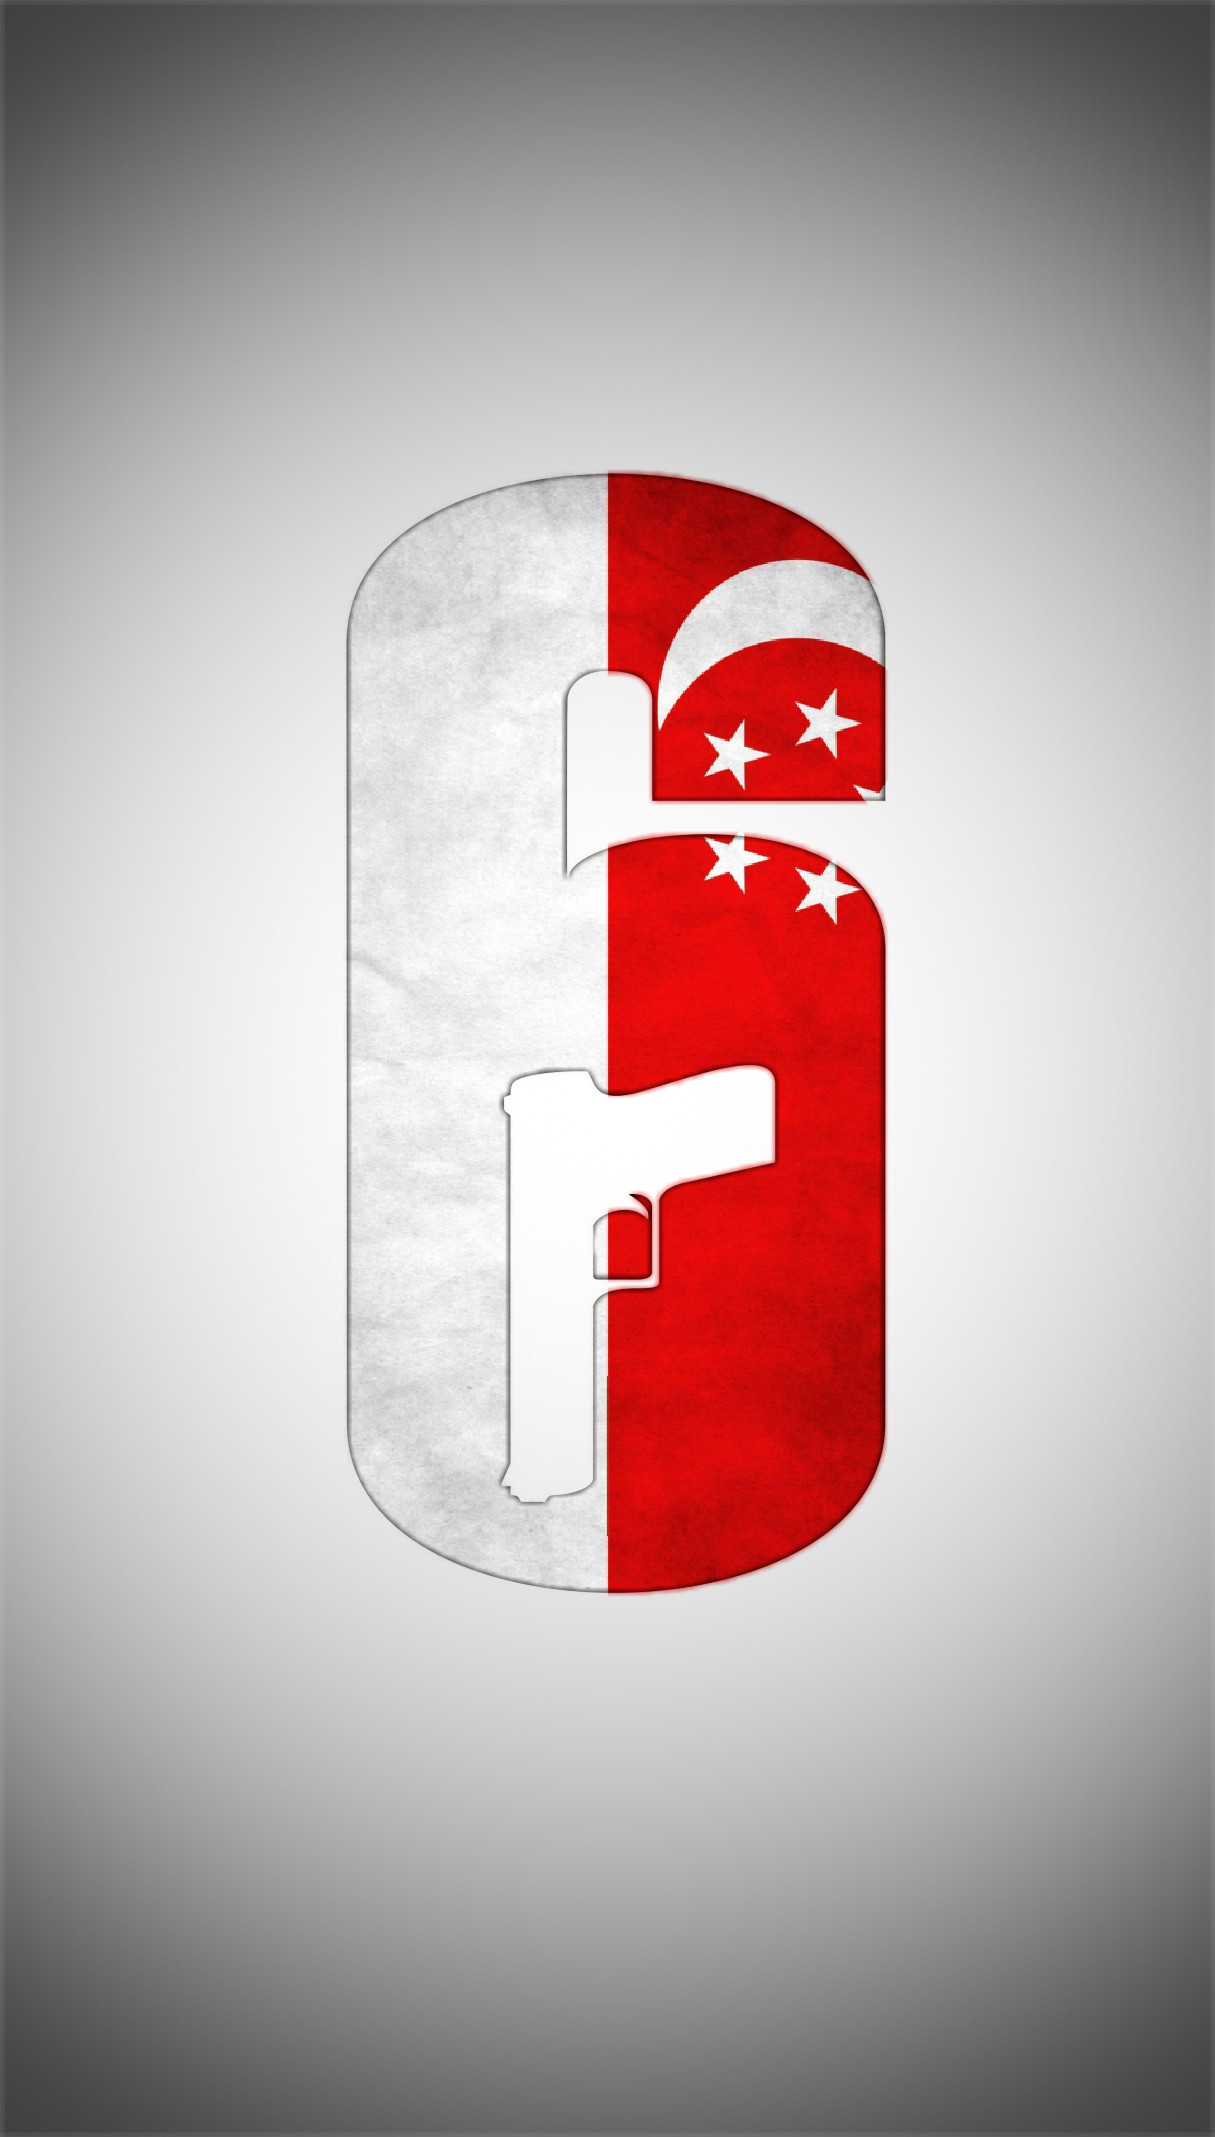 Siege Singapore Flag And Saf Camo Logo Wallpapers   - Rainbow Six Siege Red Logo - HD Wallpaper